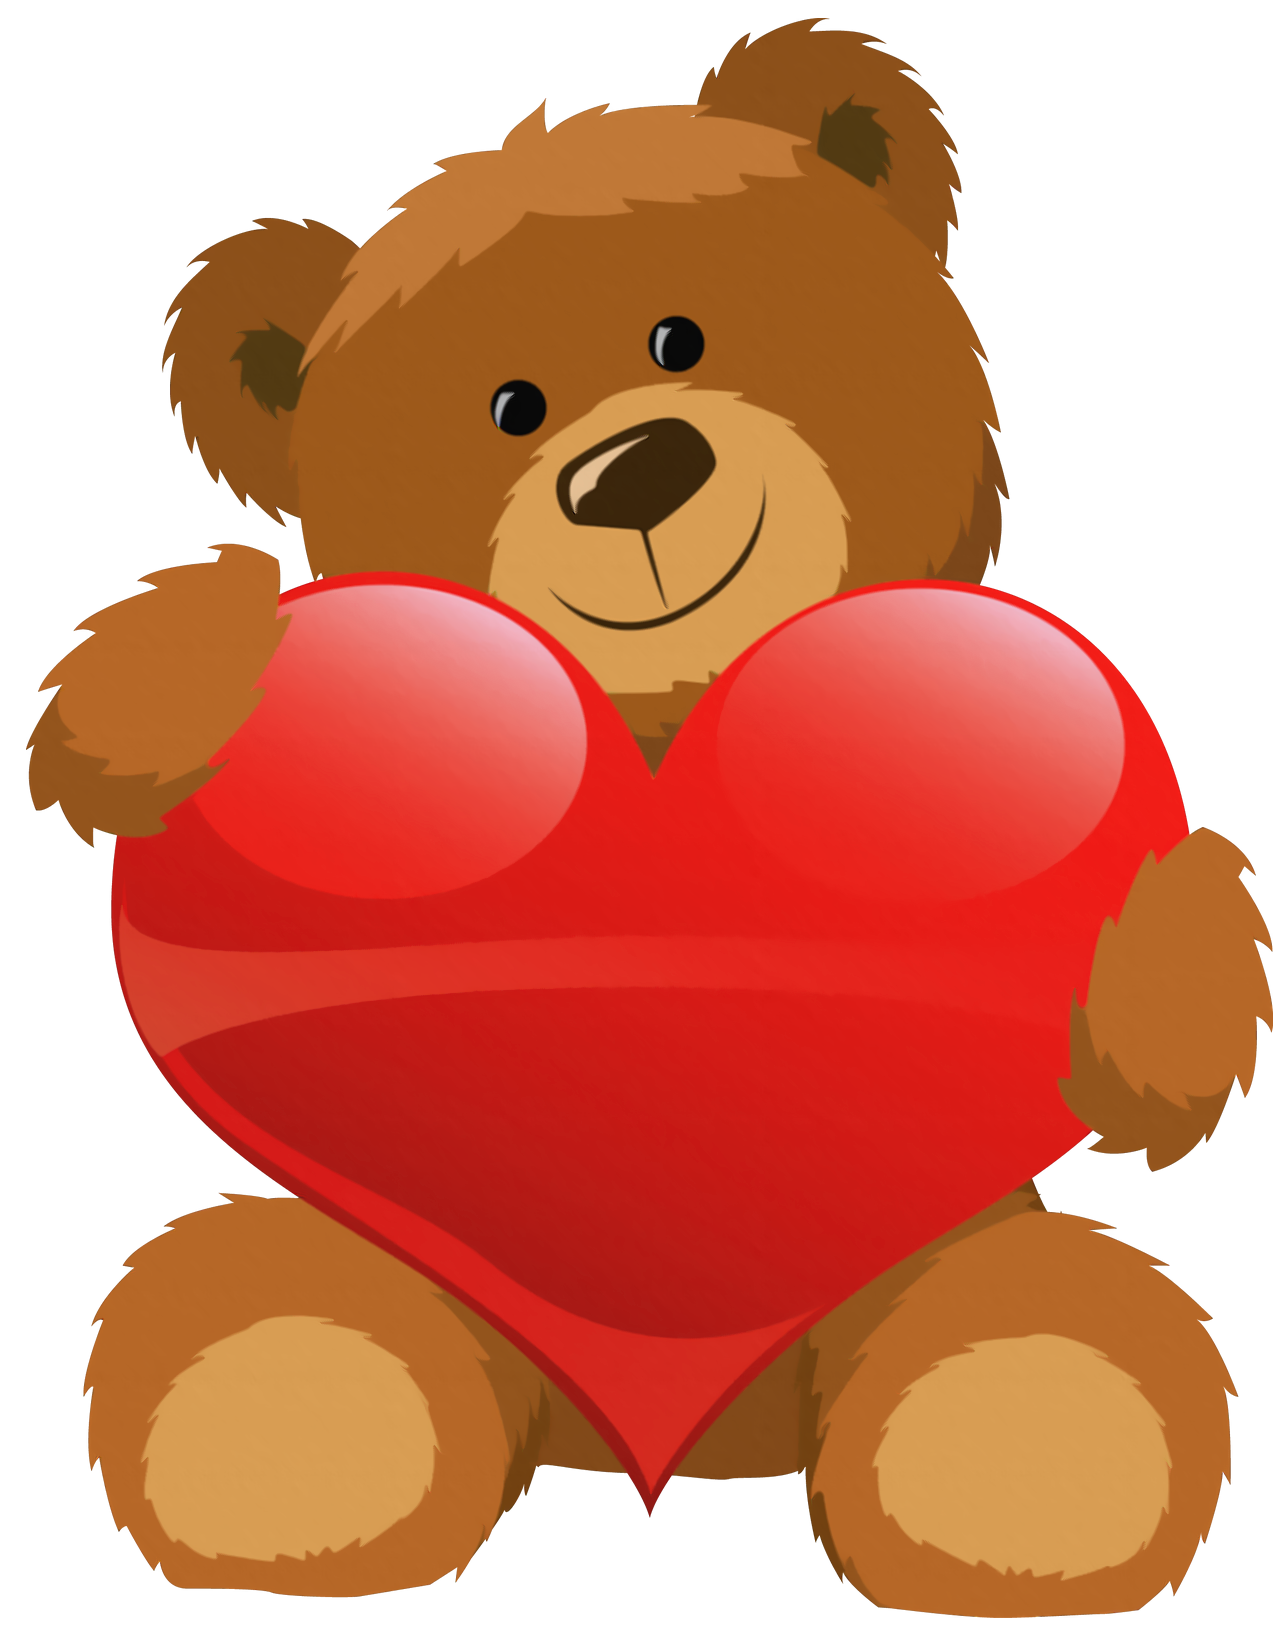 teddy bear cute bear cute teddy clipart clipartmonk free clip art images 2 bear cartoon  [ 1285 x 1632 Pixel ]